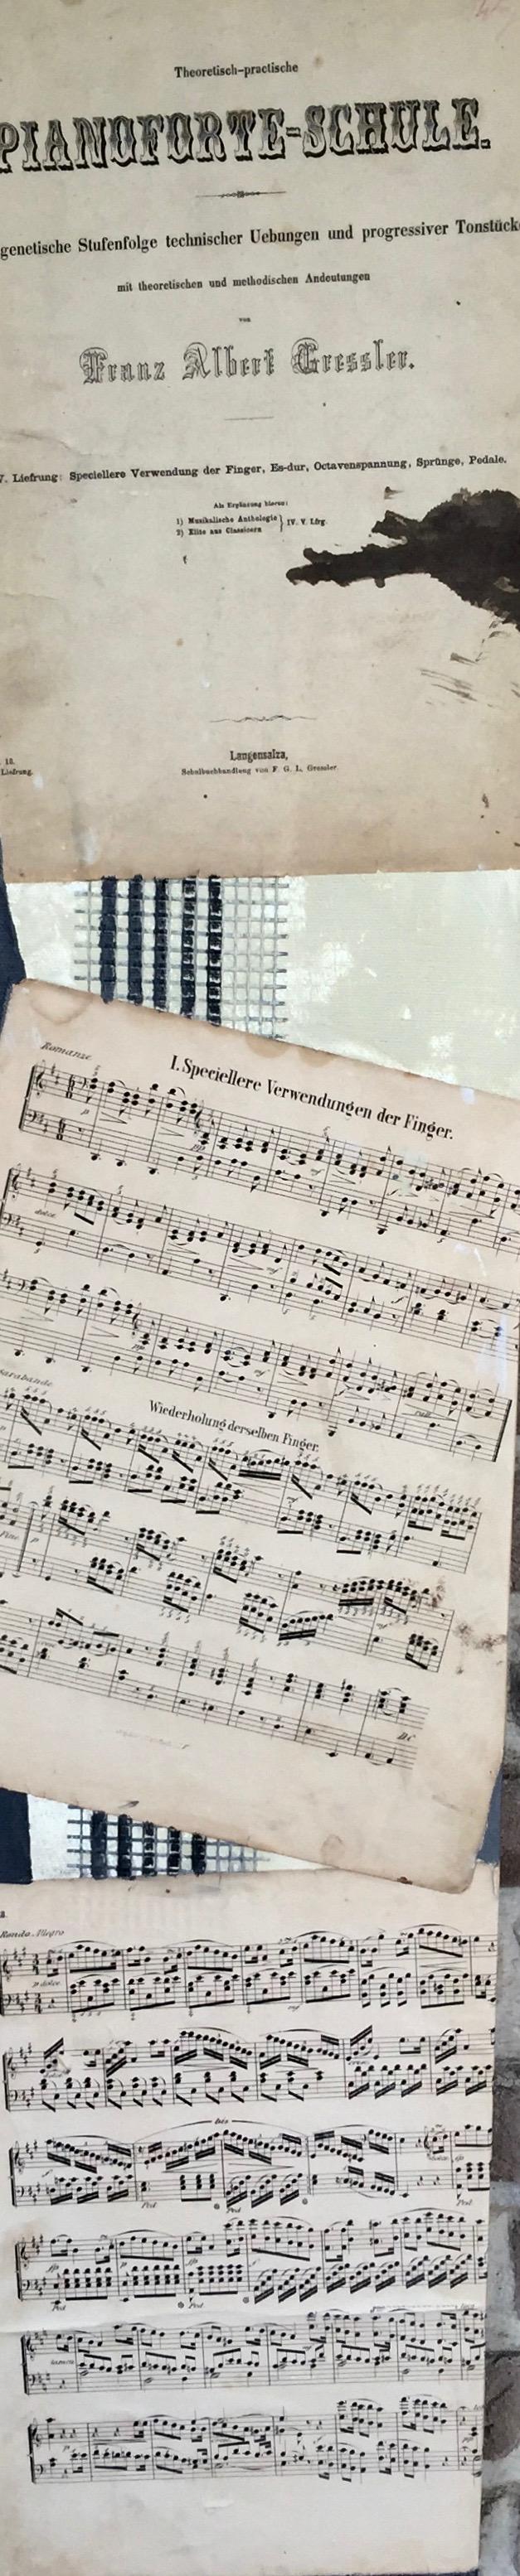 Pianoforte (2018)